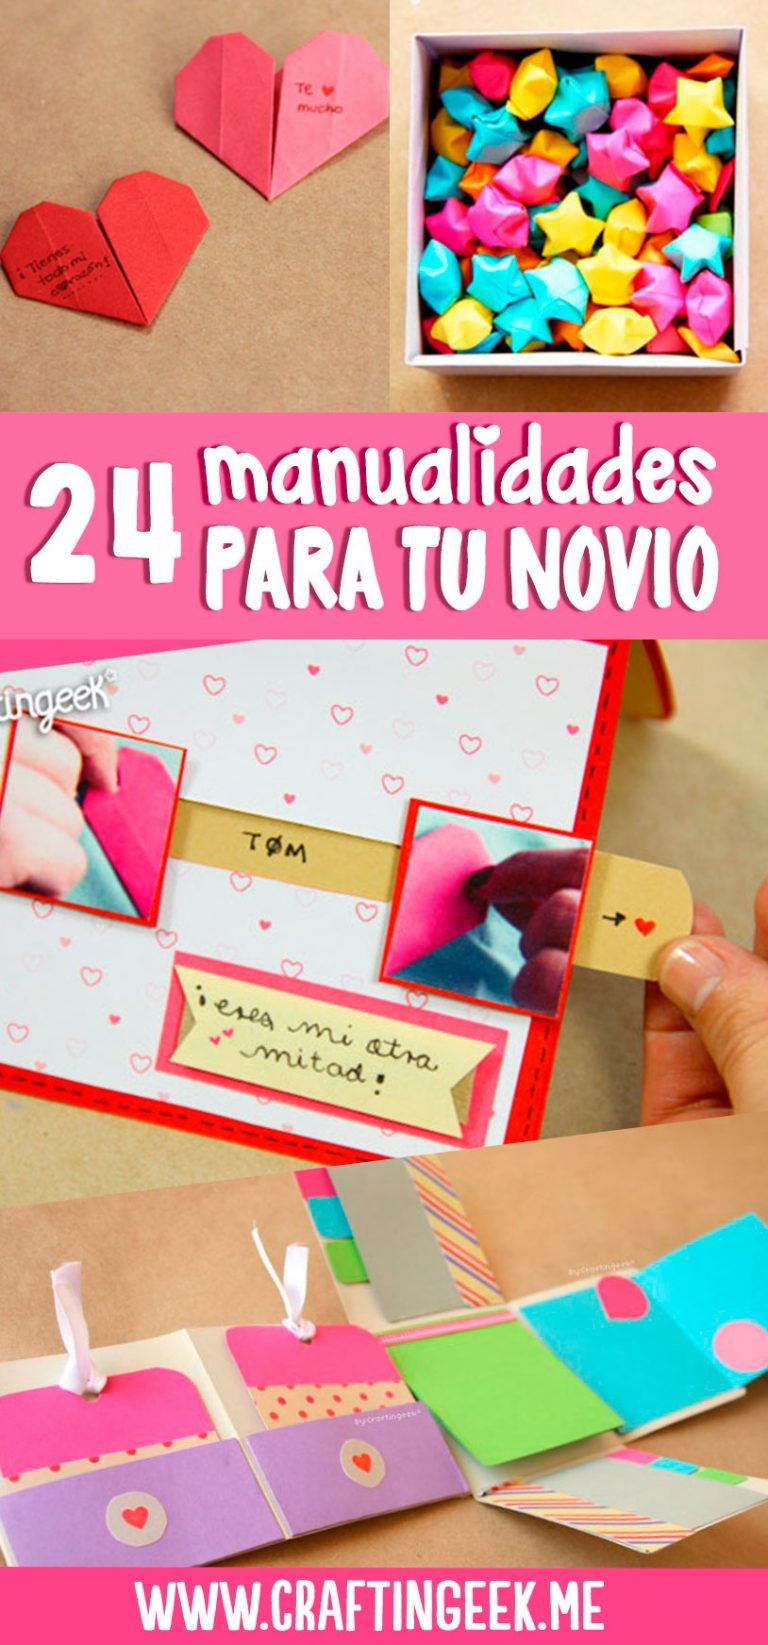 Regalos De San Valentin Para Mi Novio Manualidades.24 Manualidades Para Tu Novio O Novia Manualidades Para Mi